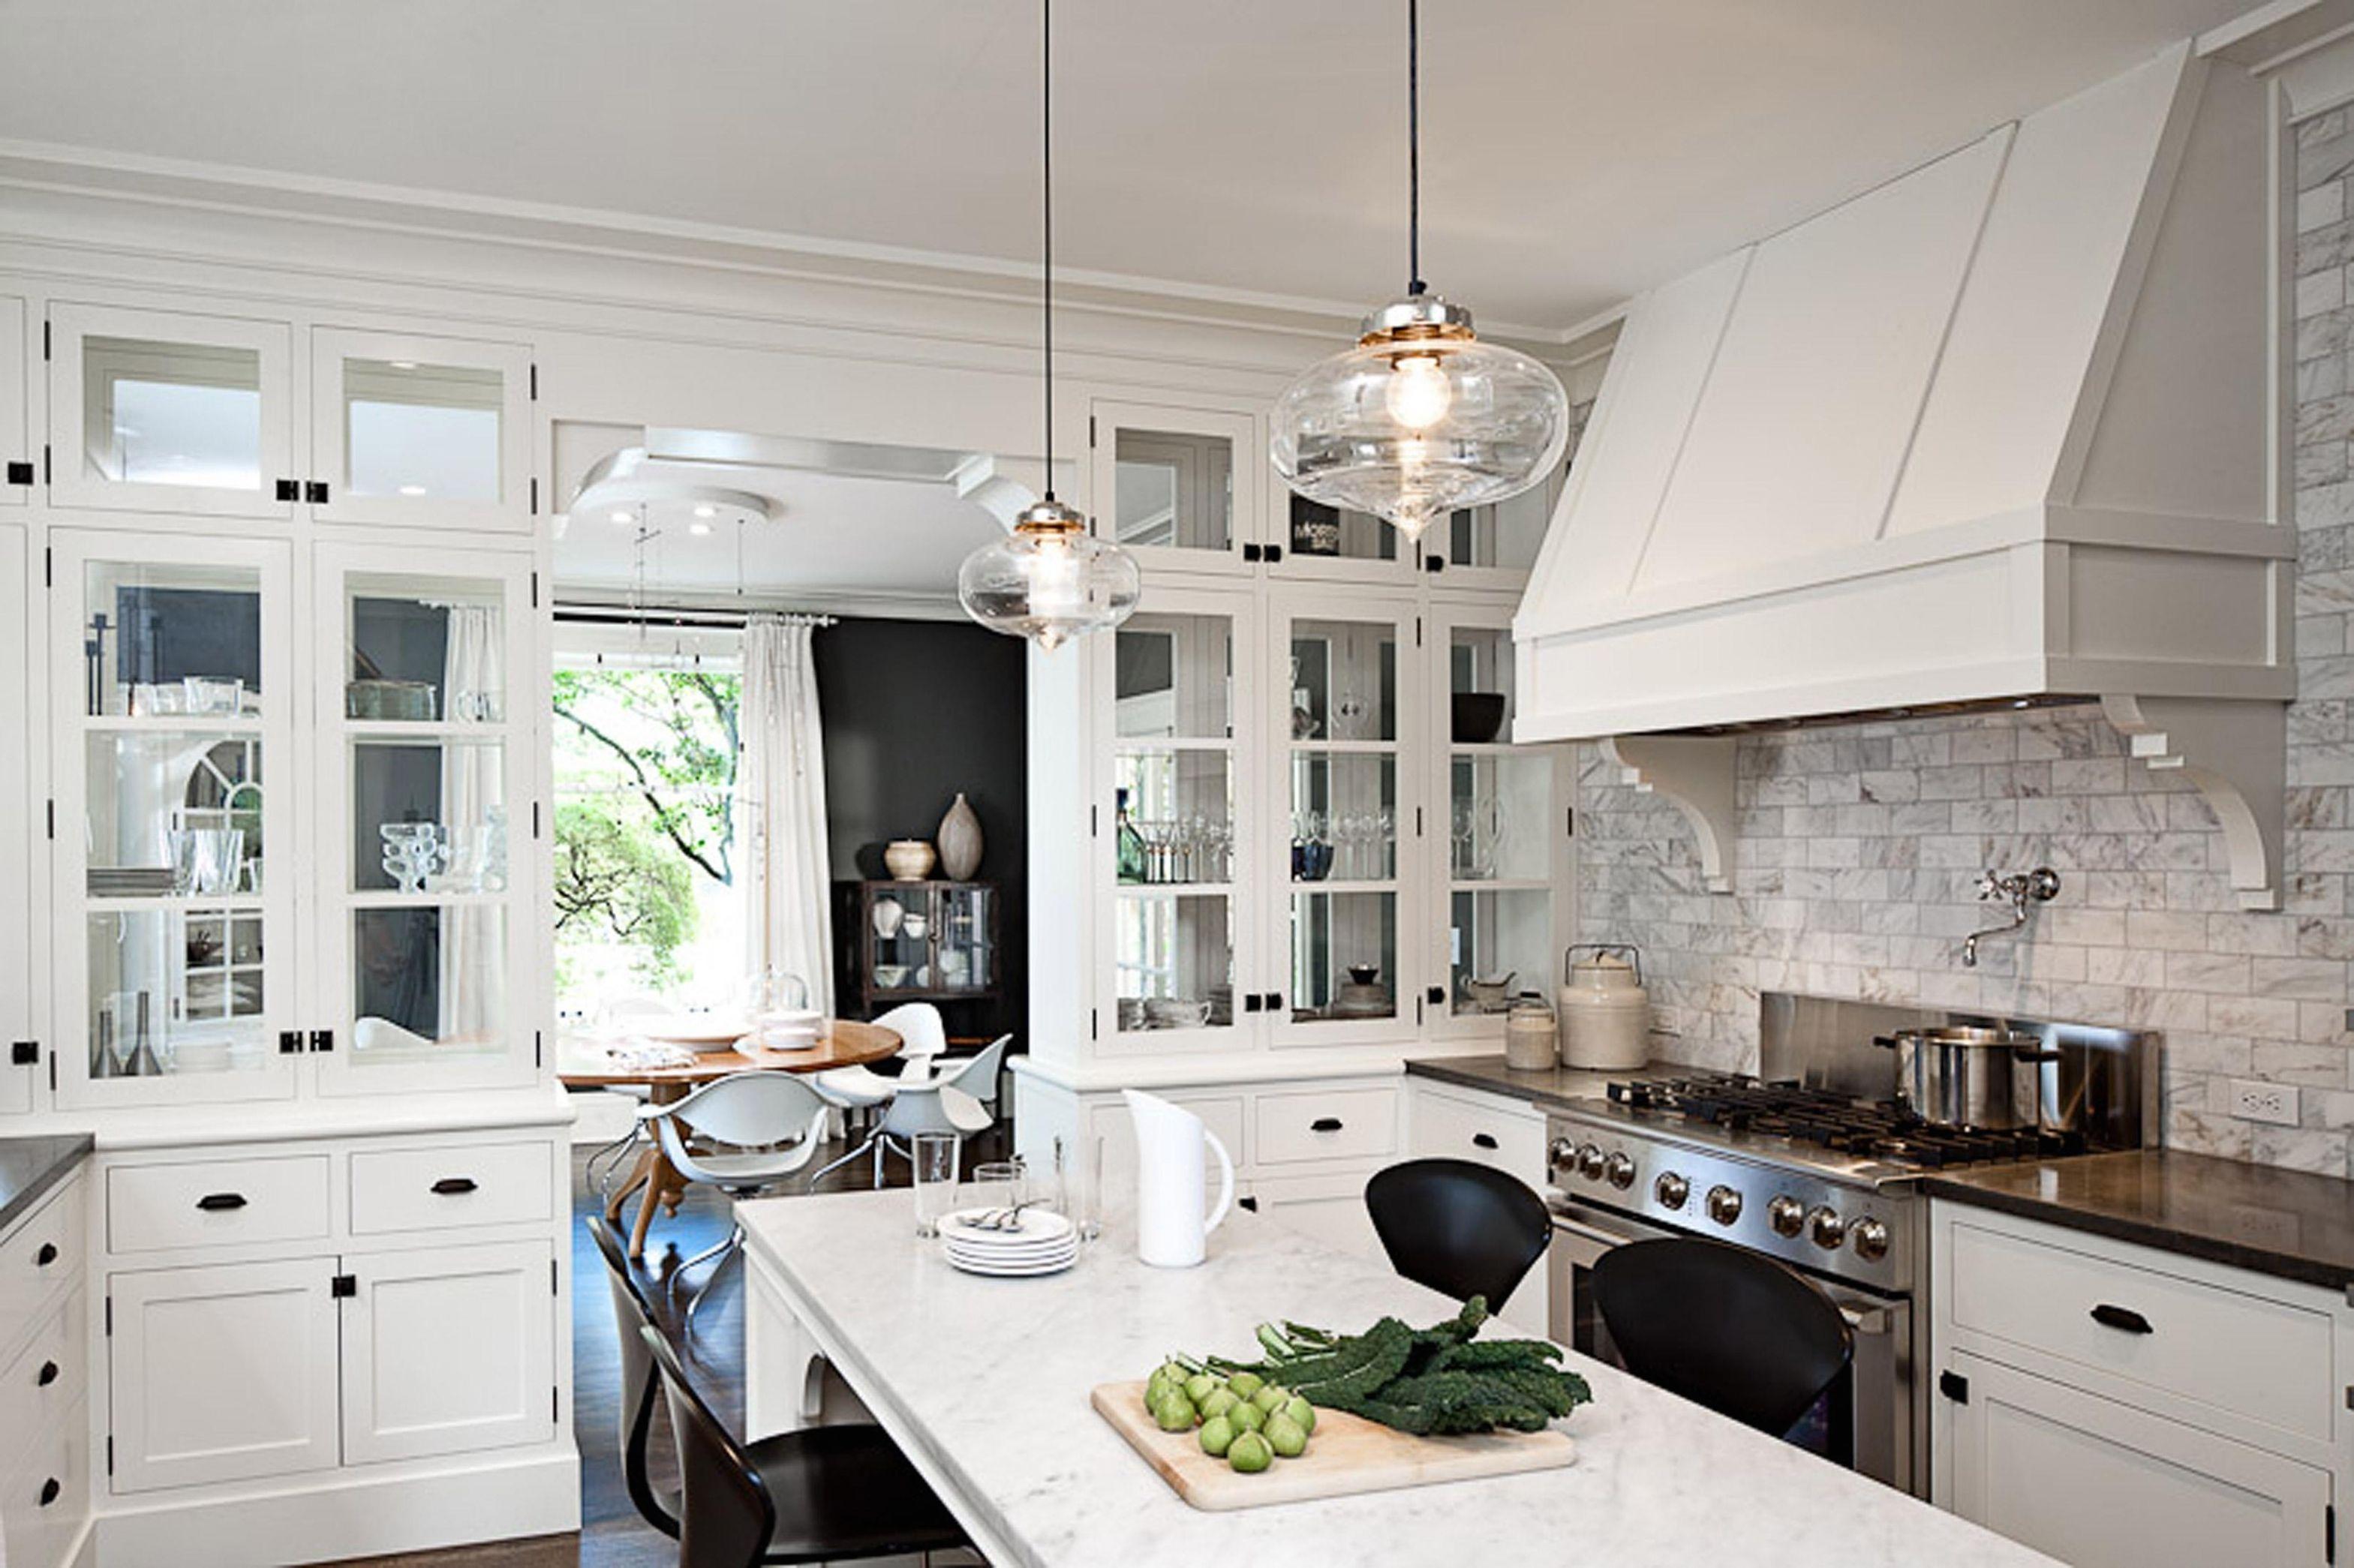 Elegant kitchen pendant lights over island jk kitchen